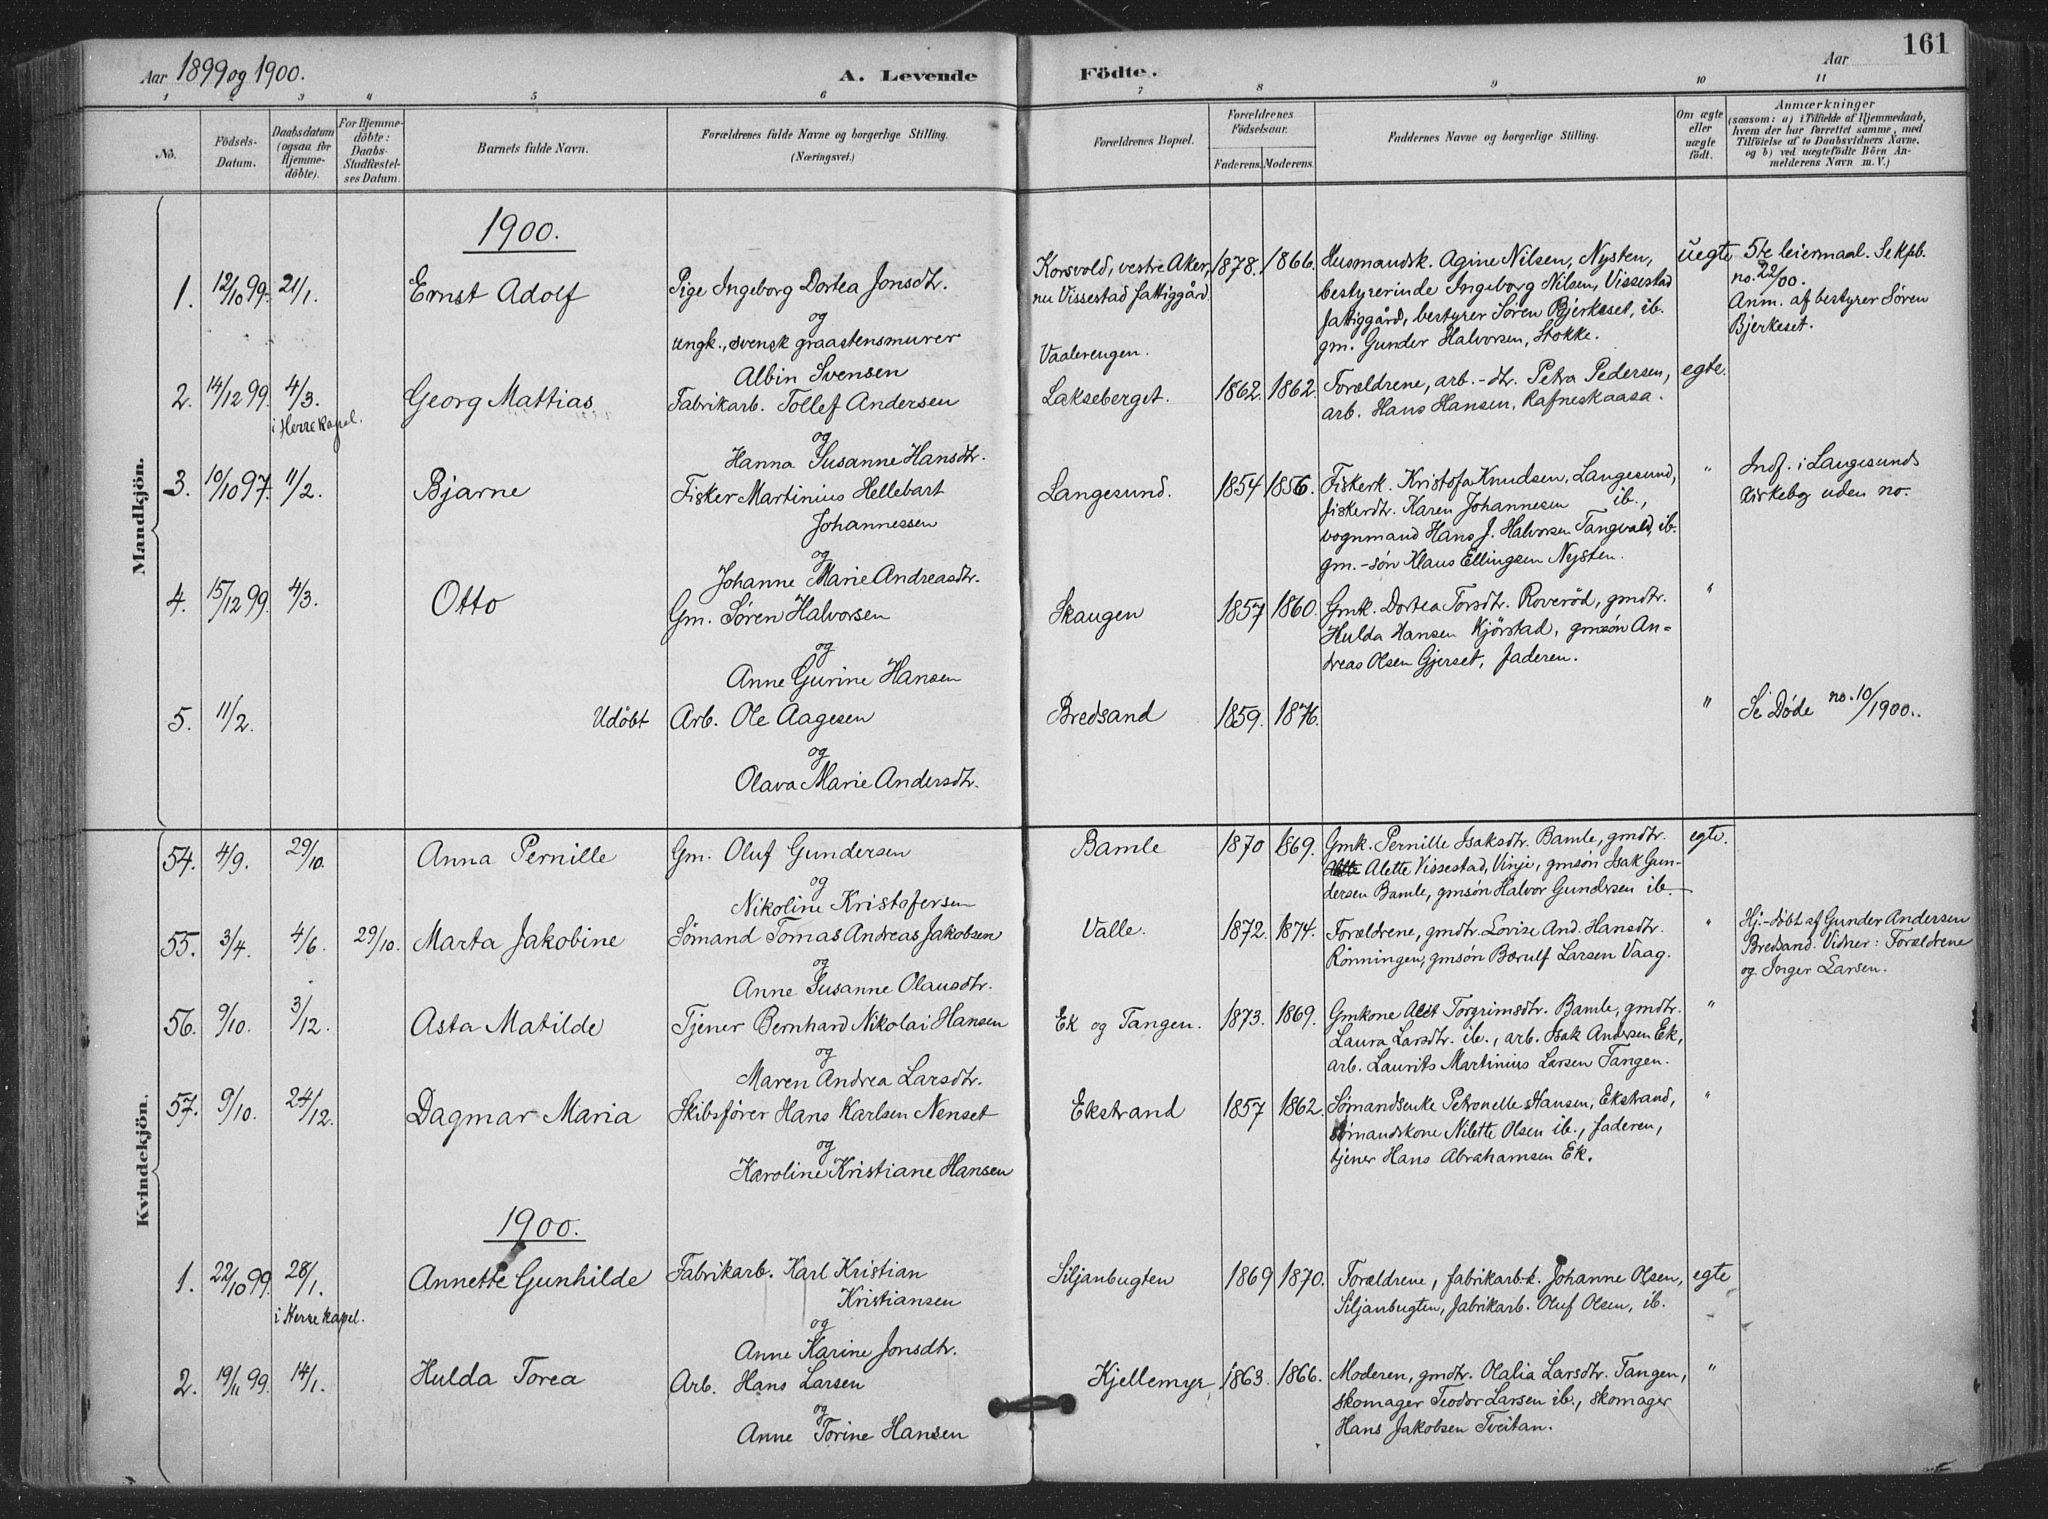 SAKO, Bamble kirkebøker, F/Fa/L0008: Ministerialbok nr. I 8, 1888-1900, s. 161